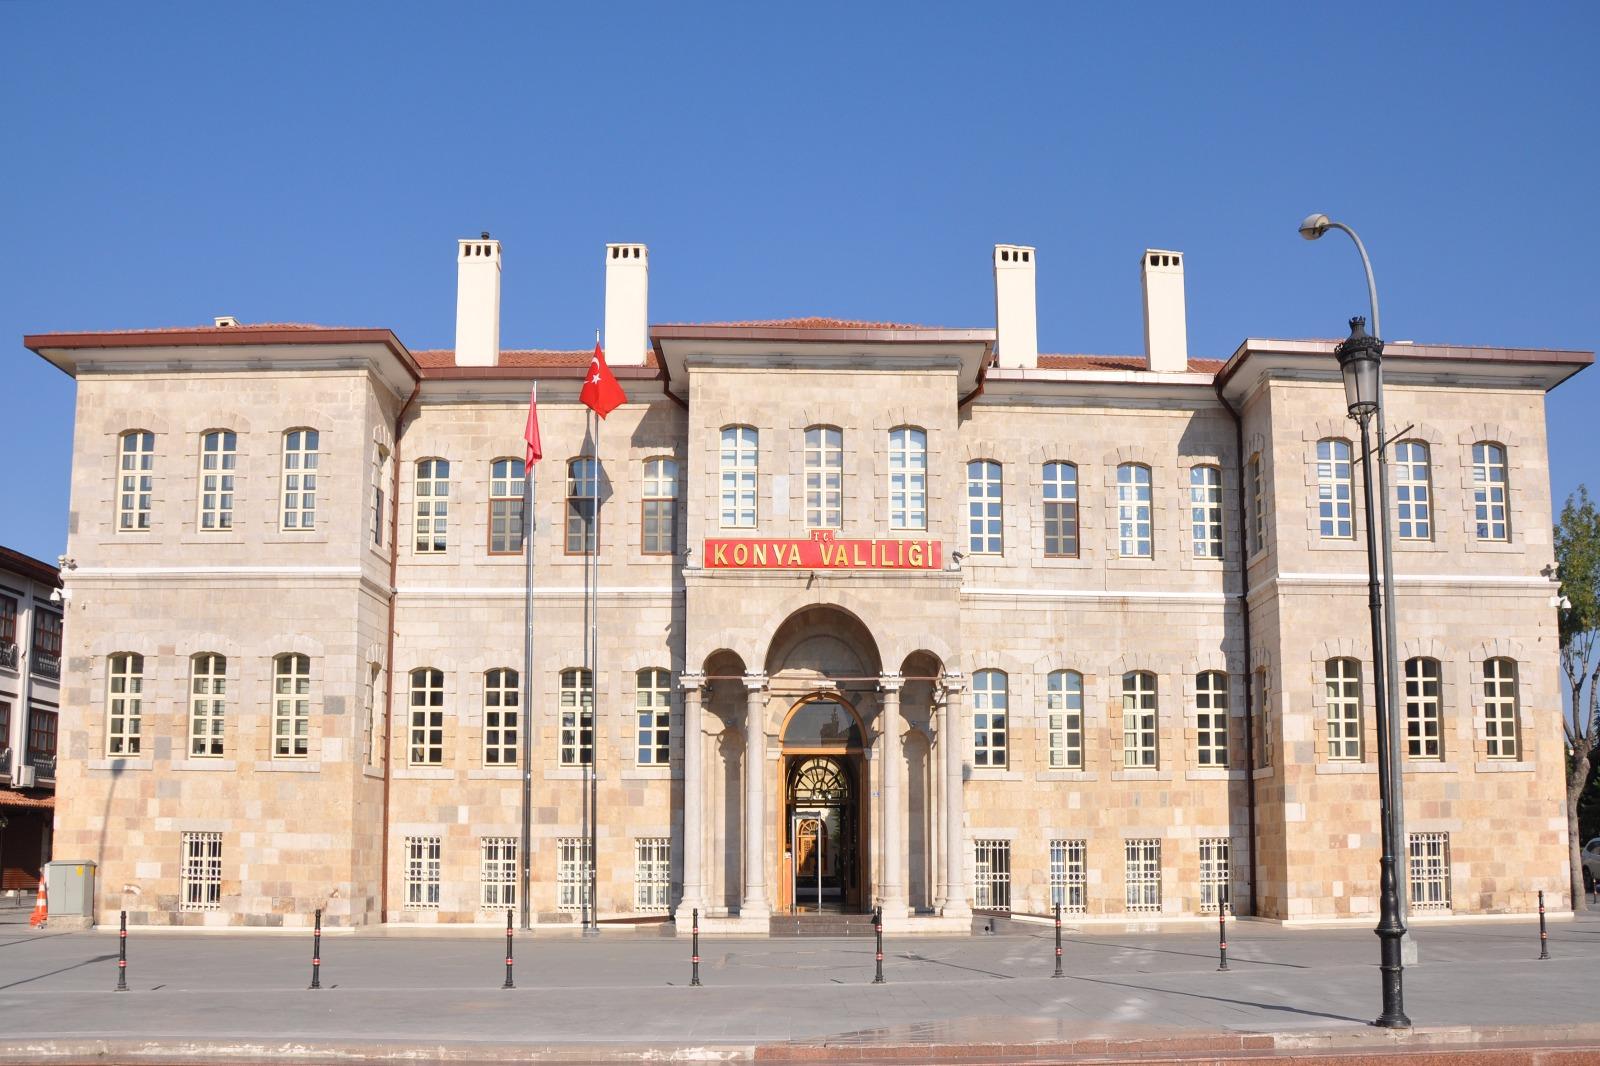 Konya'da 2 bin 398 FETÖ tutuklusu var